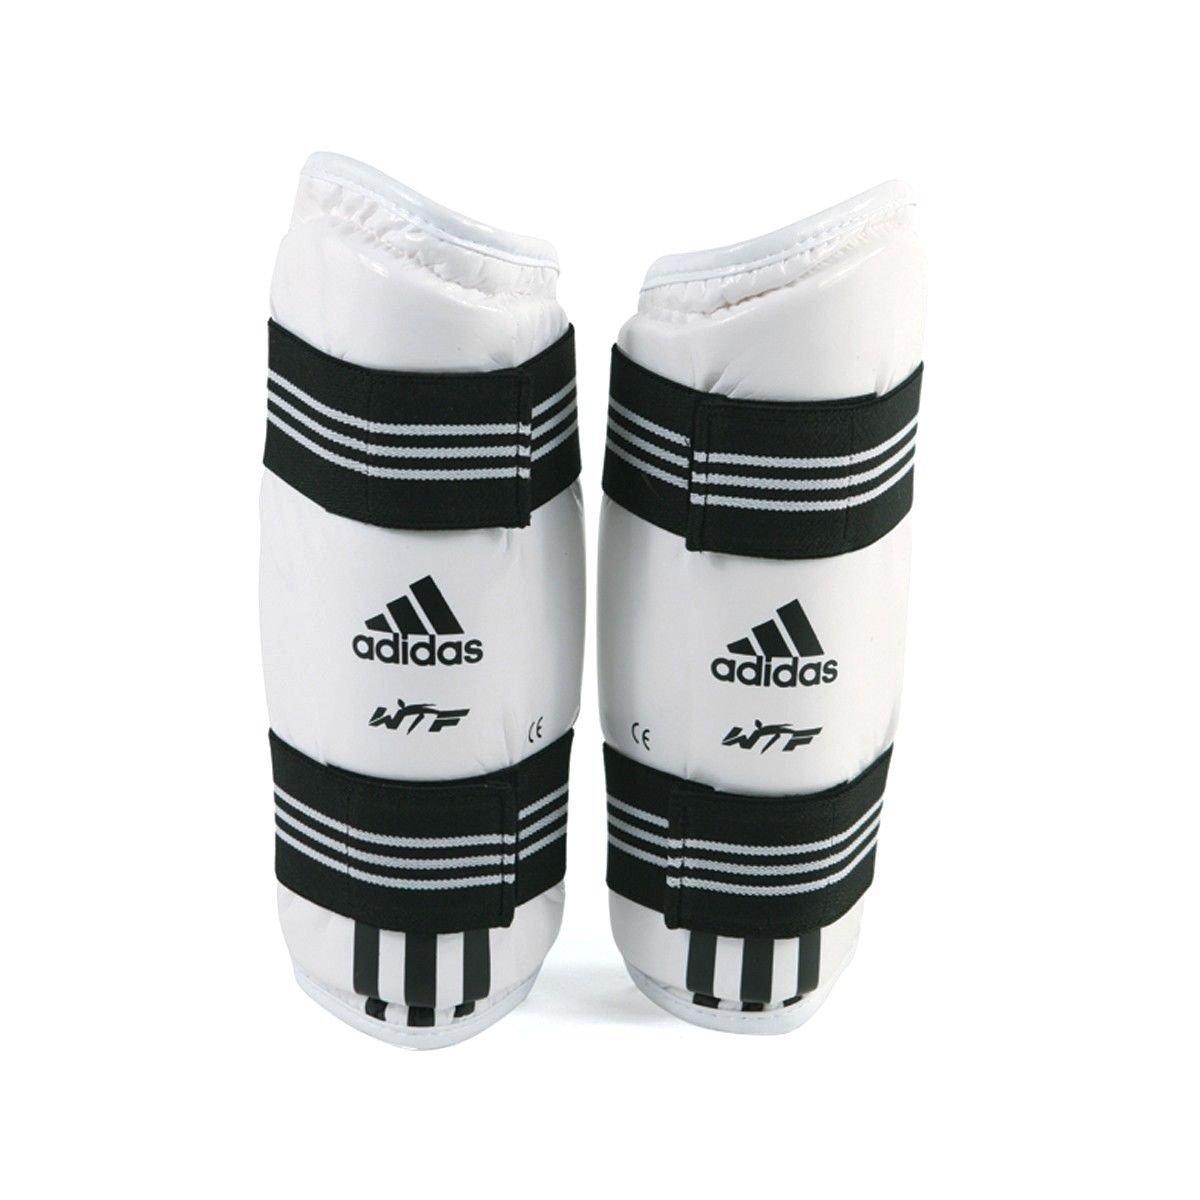 (Small) TaeKwonDo - Adidas (Small) Adidas WTF TaeKwonDo Forearm Protector B0007MBSUM, オオアサチョウ:8c1dc8ee --- capela.dominiotemporario.com